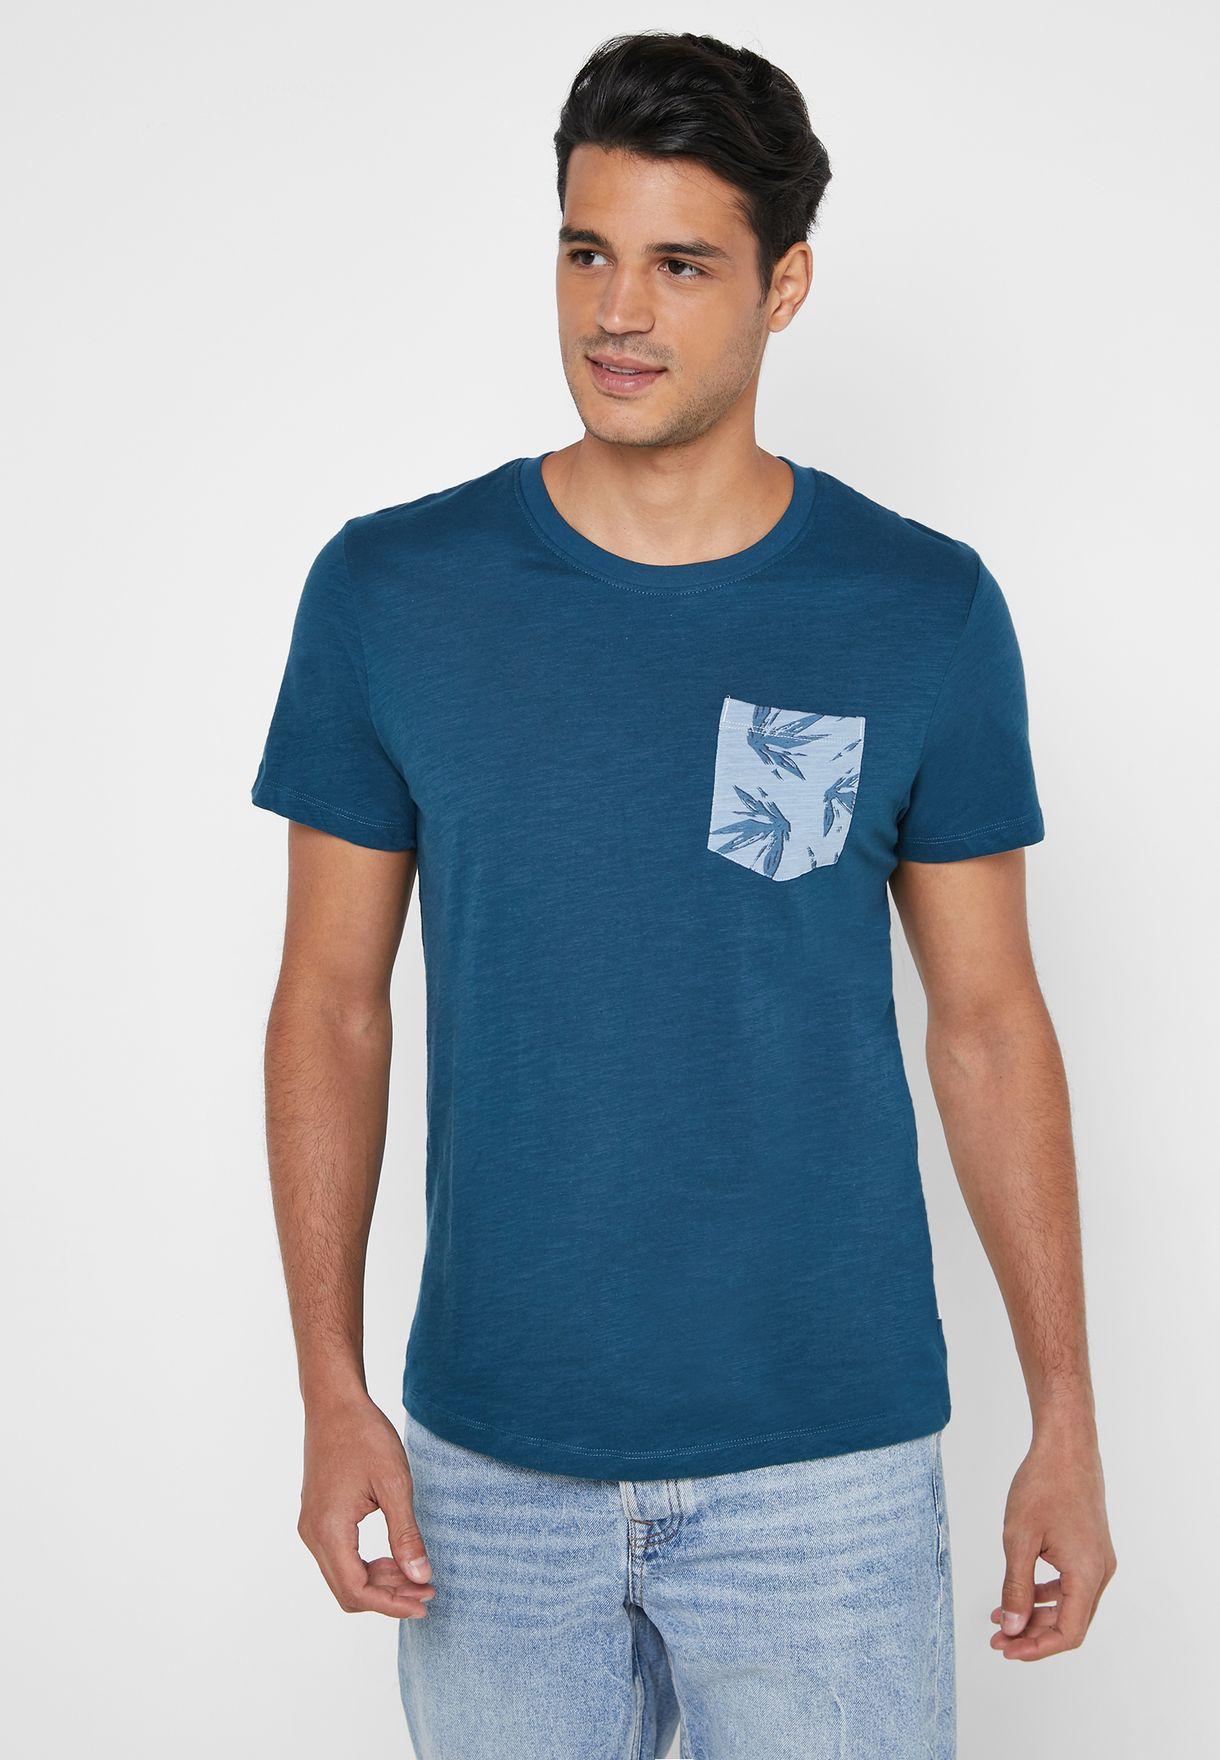 Tom Printed Pocket Crew Neck T-Shirt